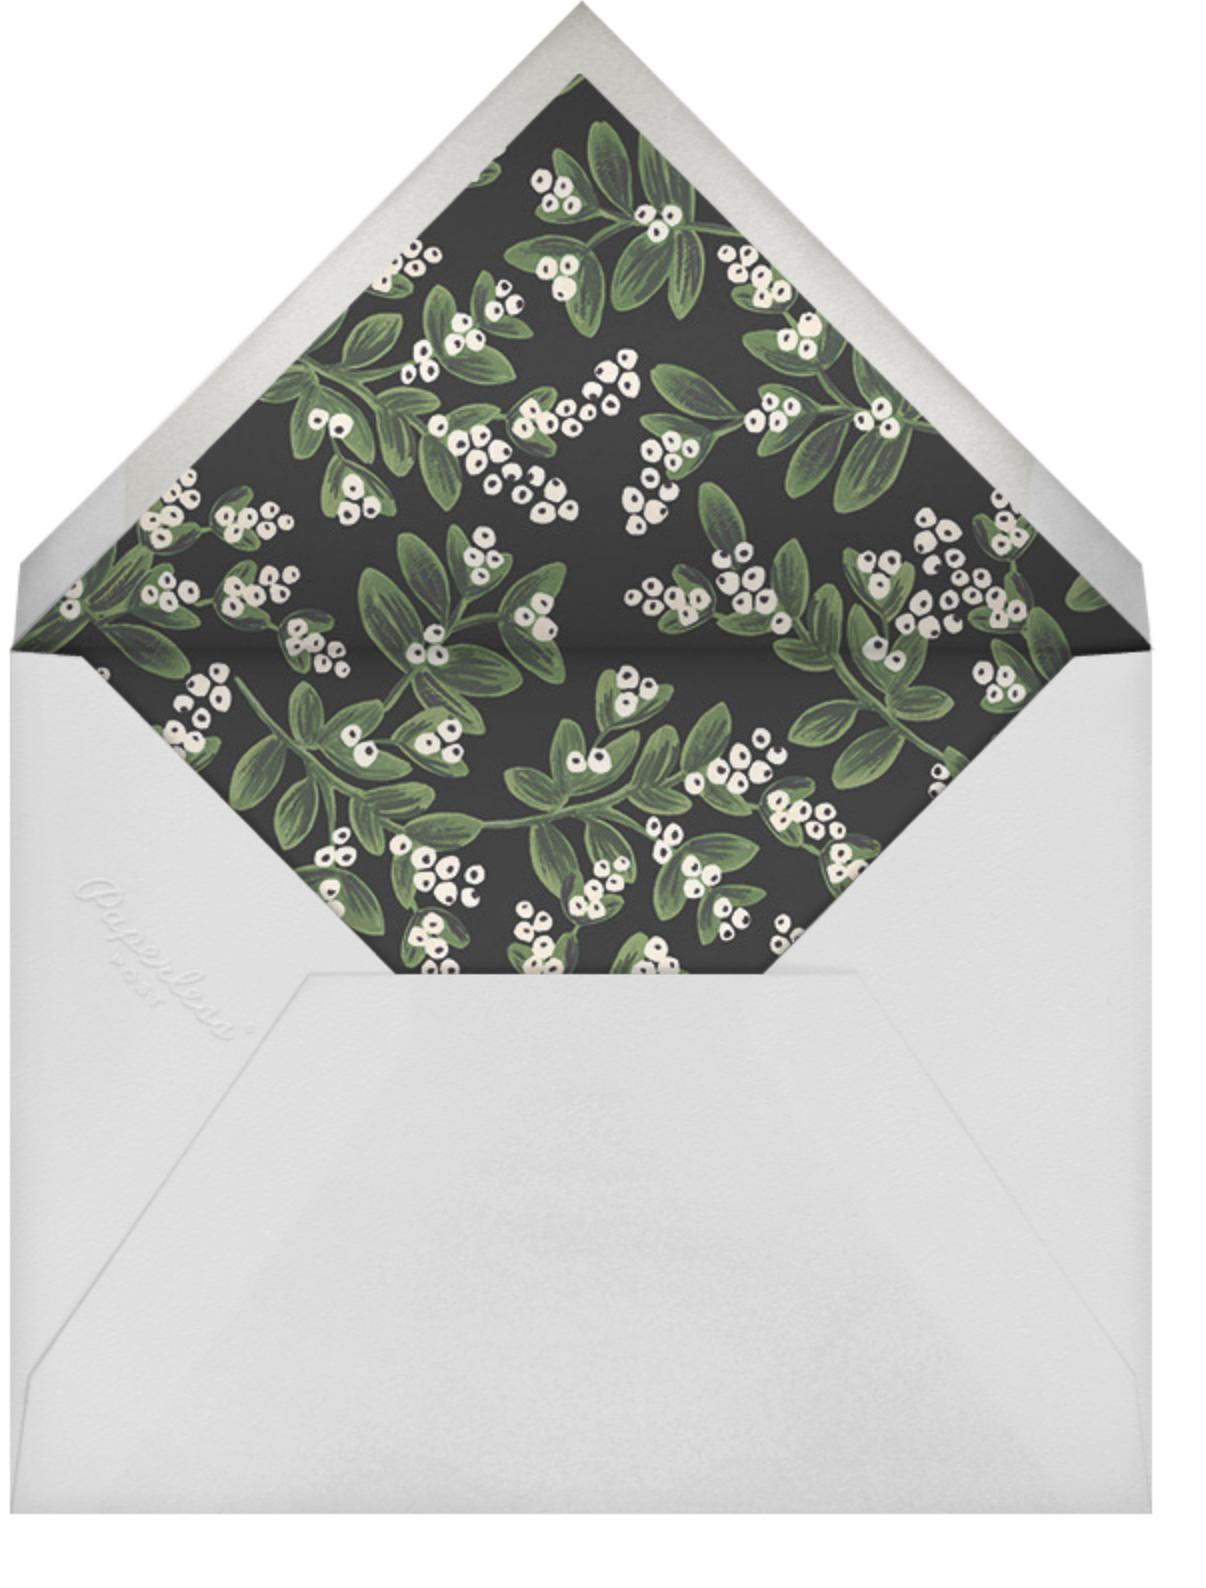 Mistletoe Accent Border (Portrait Photo) - Rifle Paper Co. - Holiday cards - envelope back